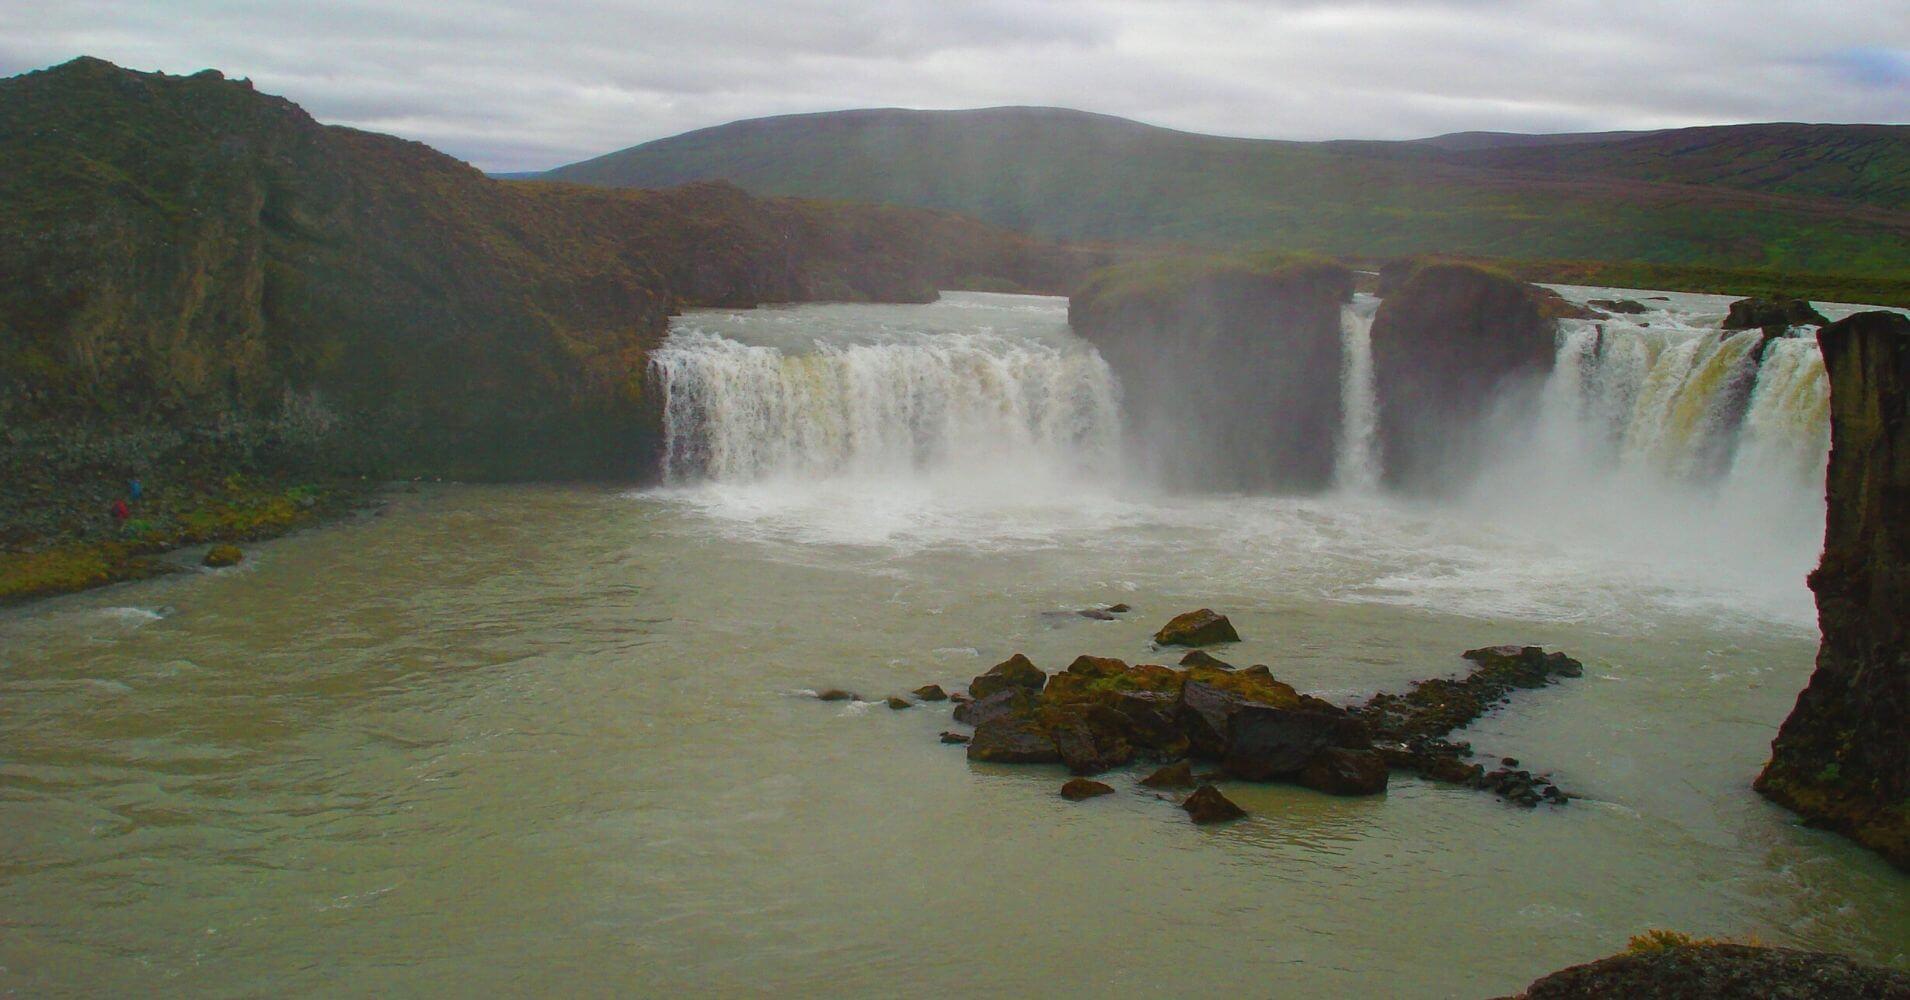 Cascada Góðafoss. Lago Mývatn. Norte de Islandia.